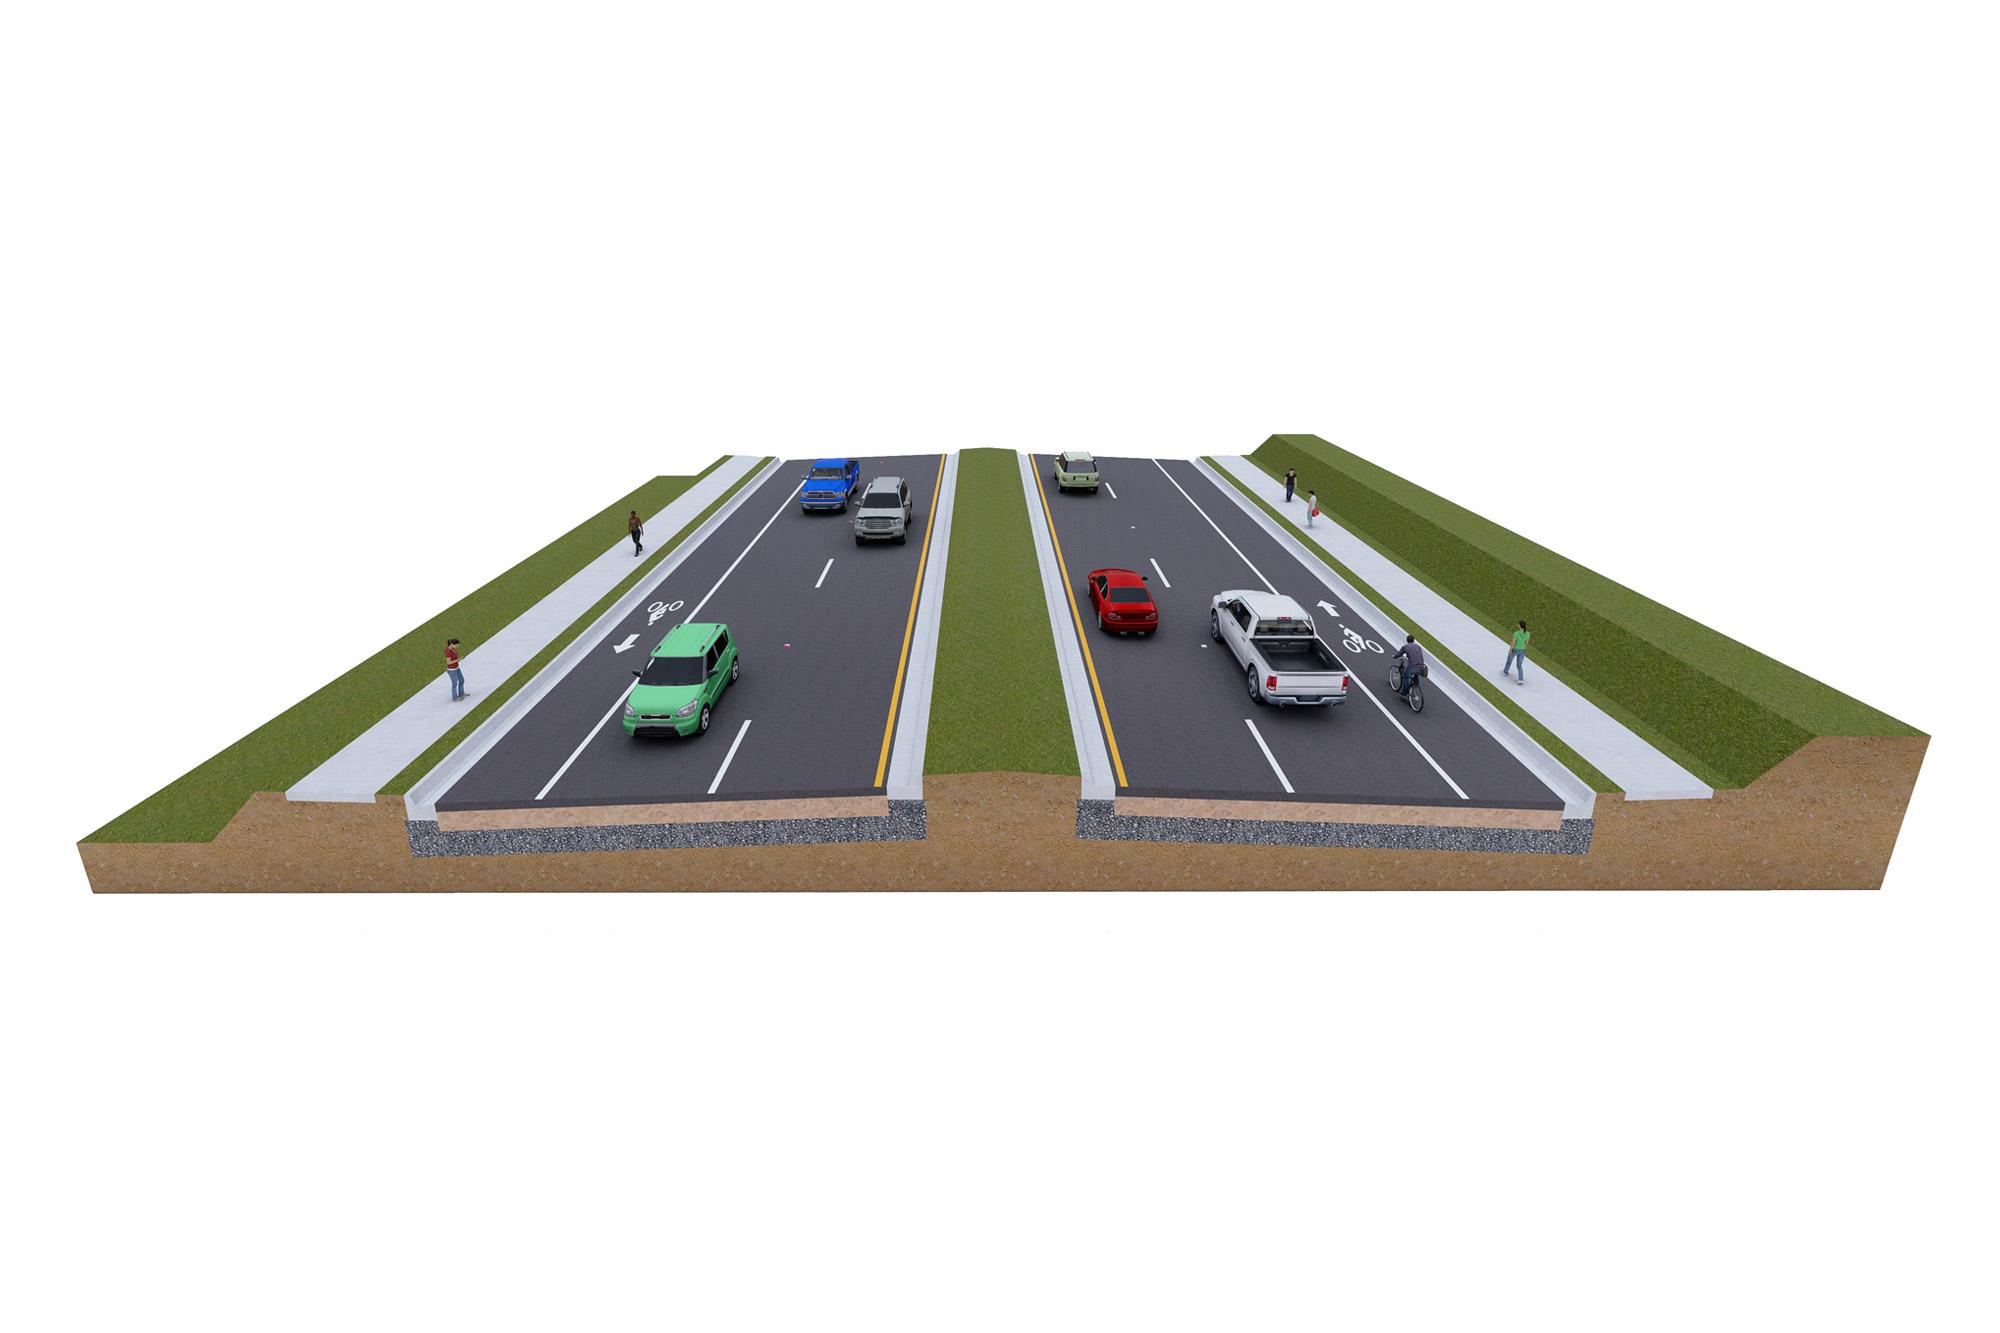 SR 544 Roadway